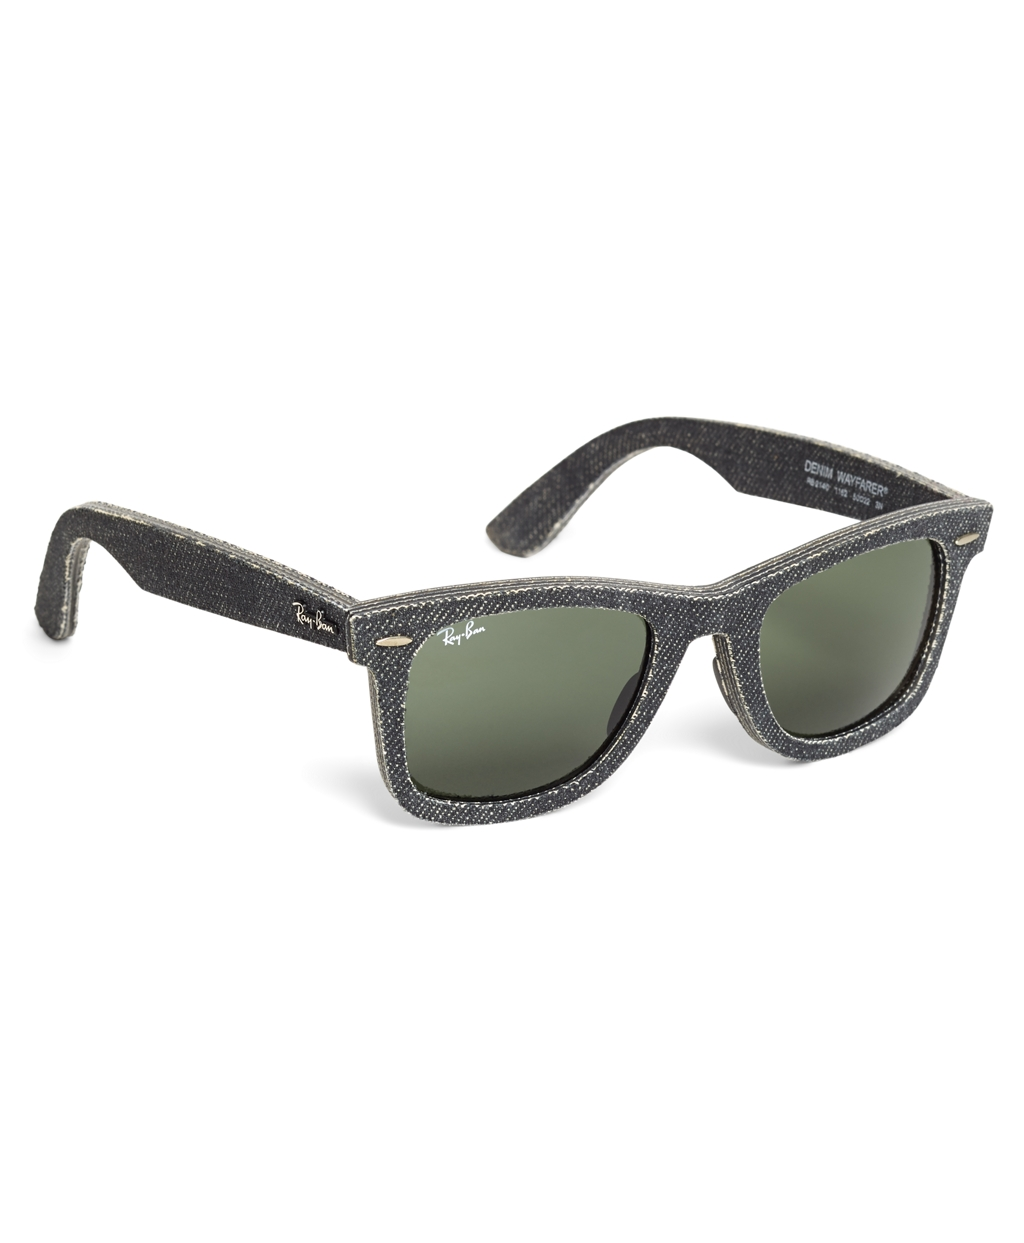 Ray-Ban Wayfarer Black Denim Sunglasses   Brooks Brothers